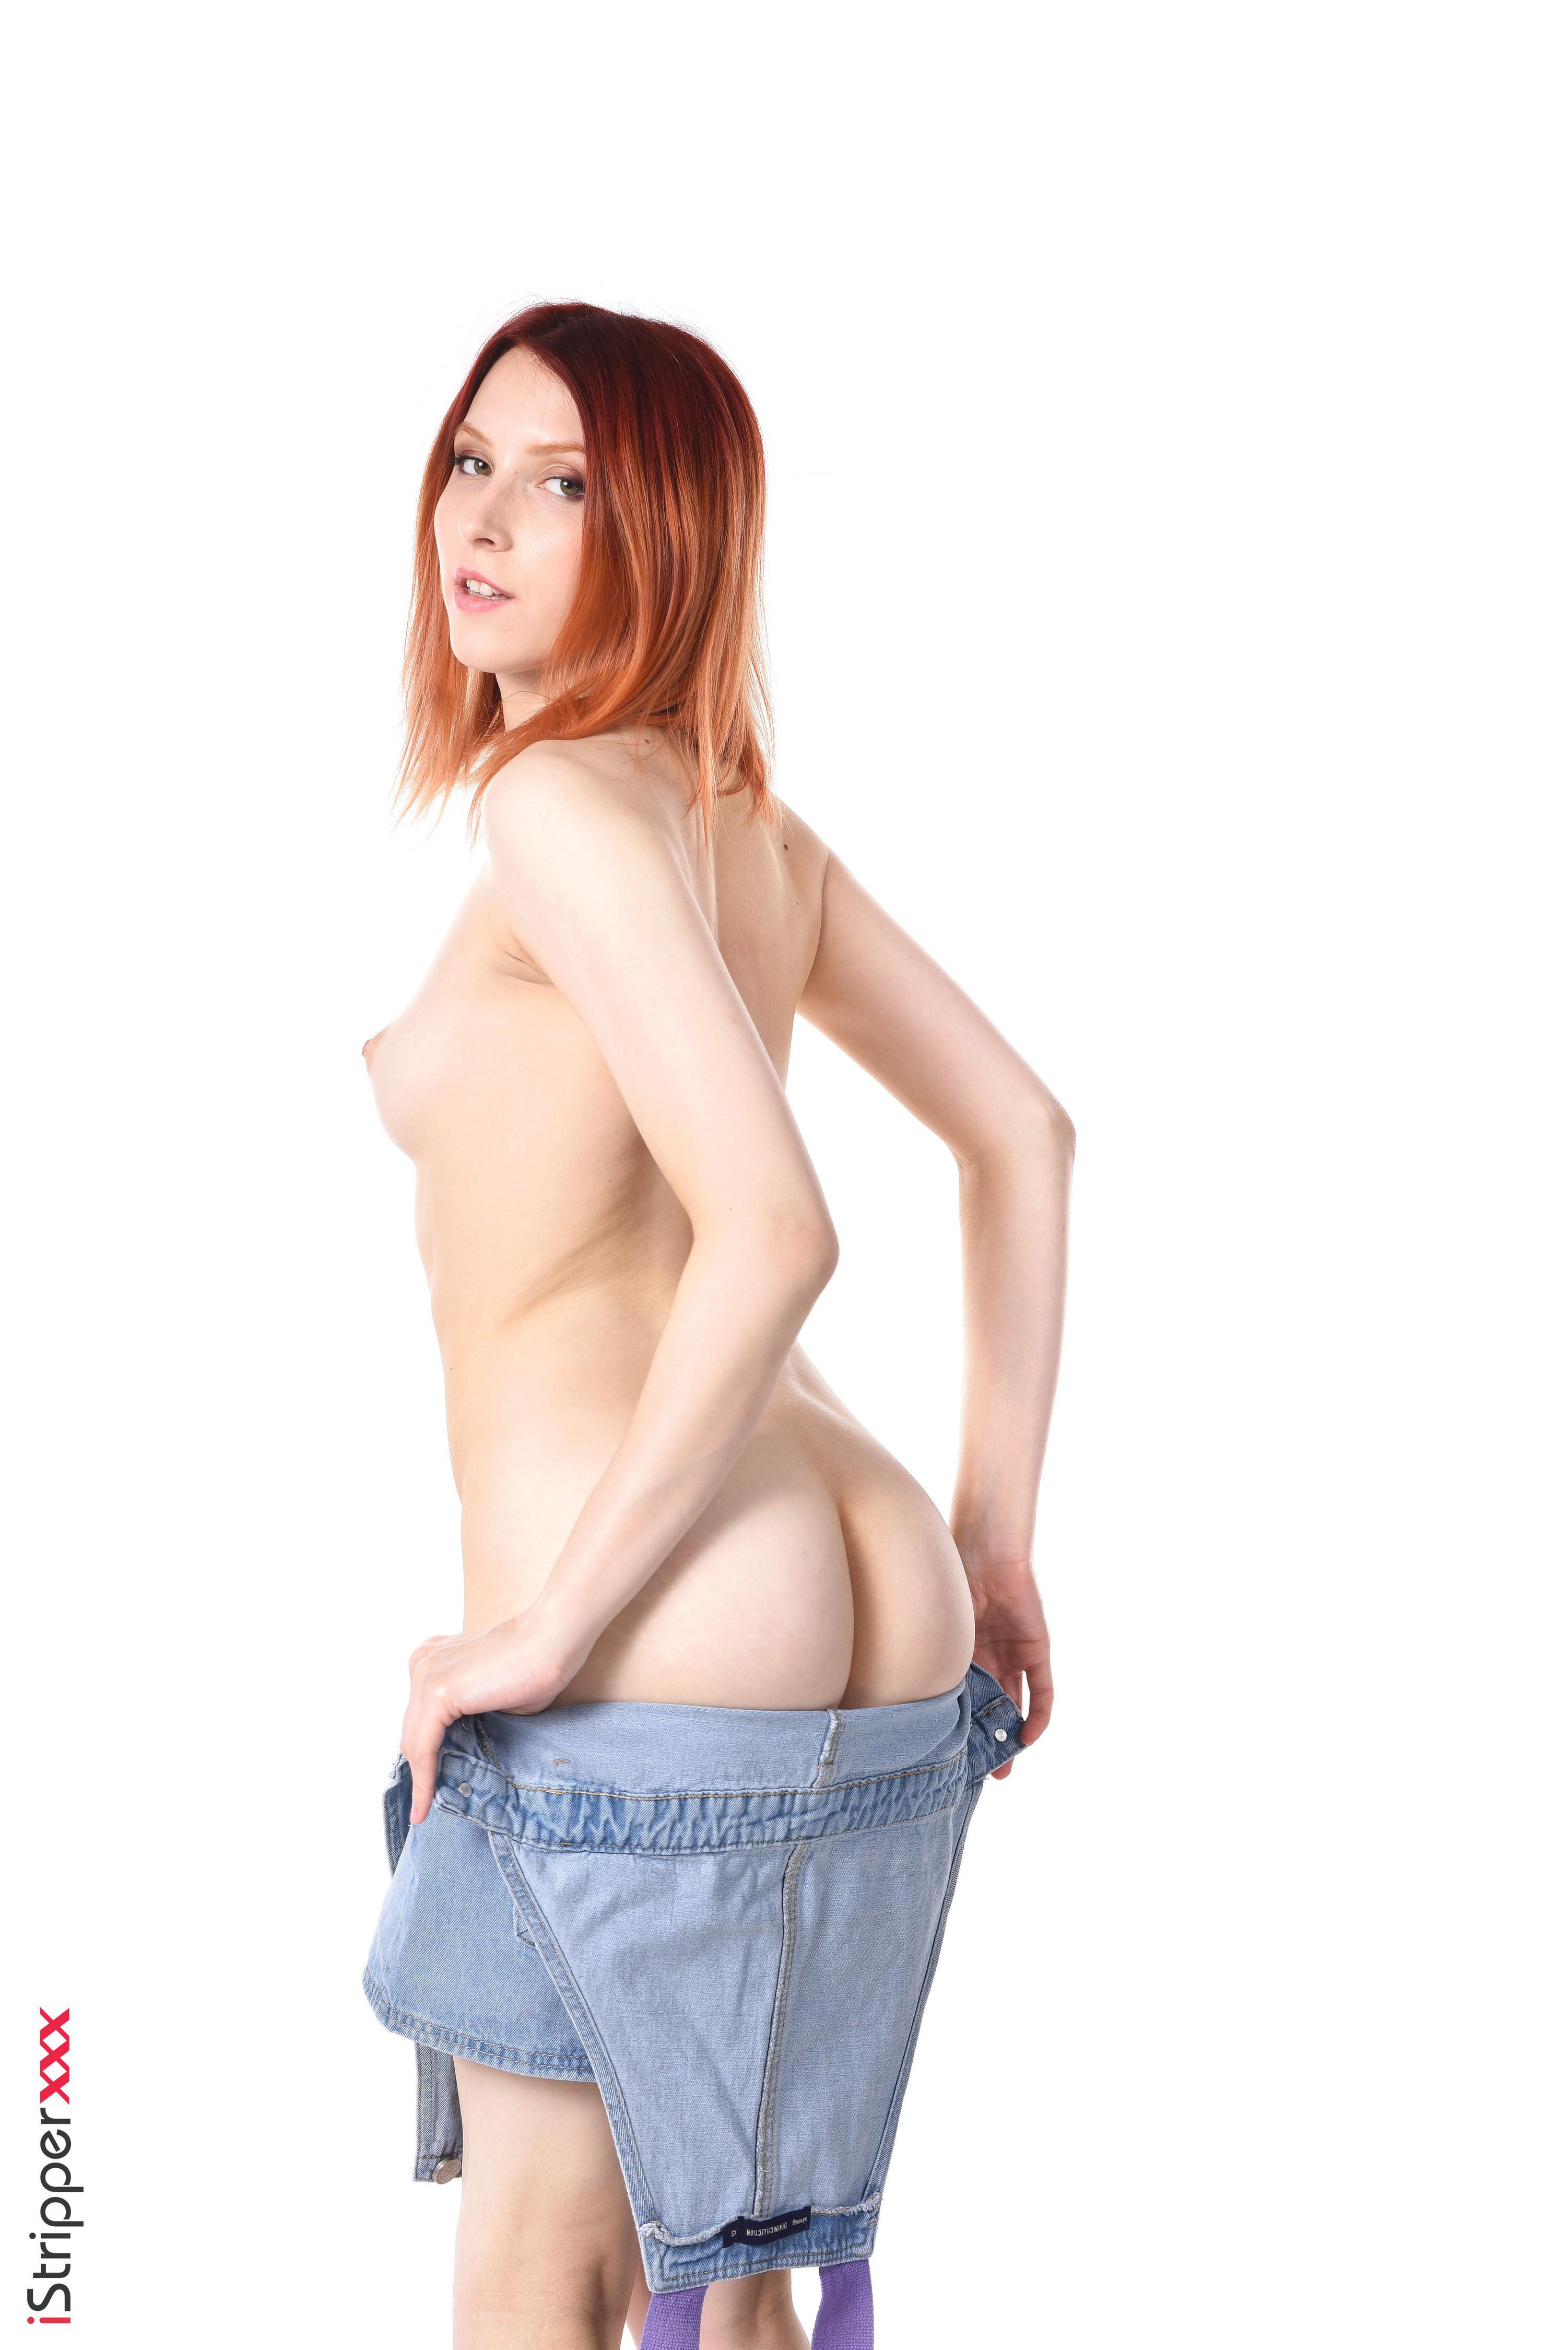 naked Huge boobed Preggo cuties boobed chicks wallpaper